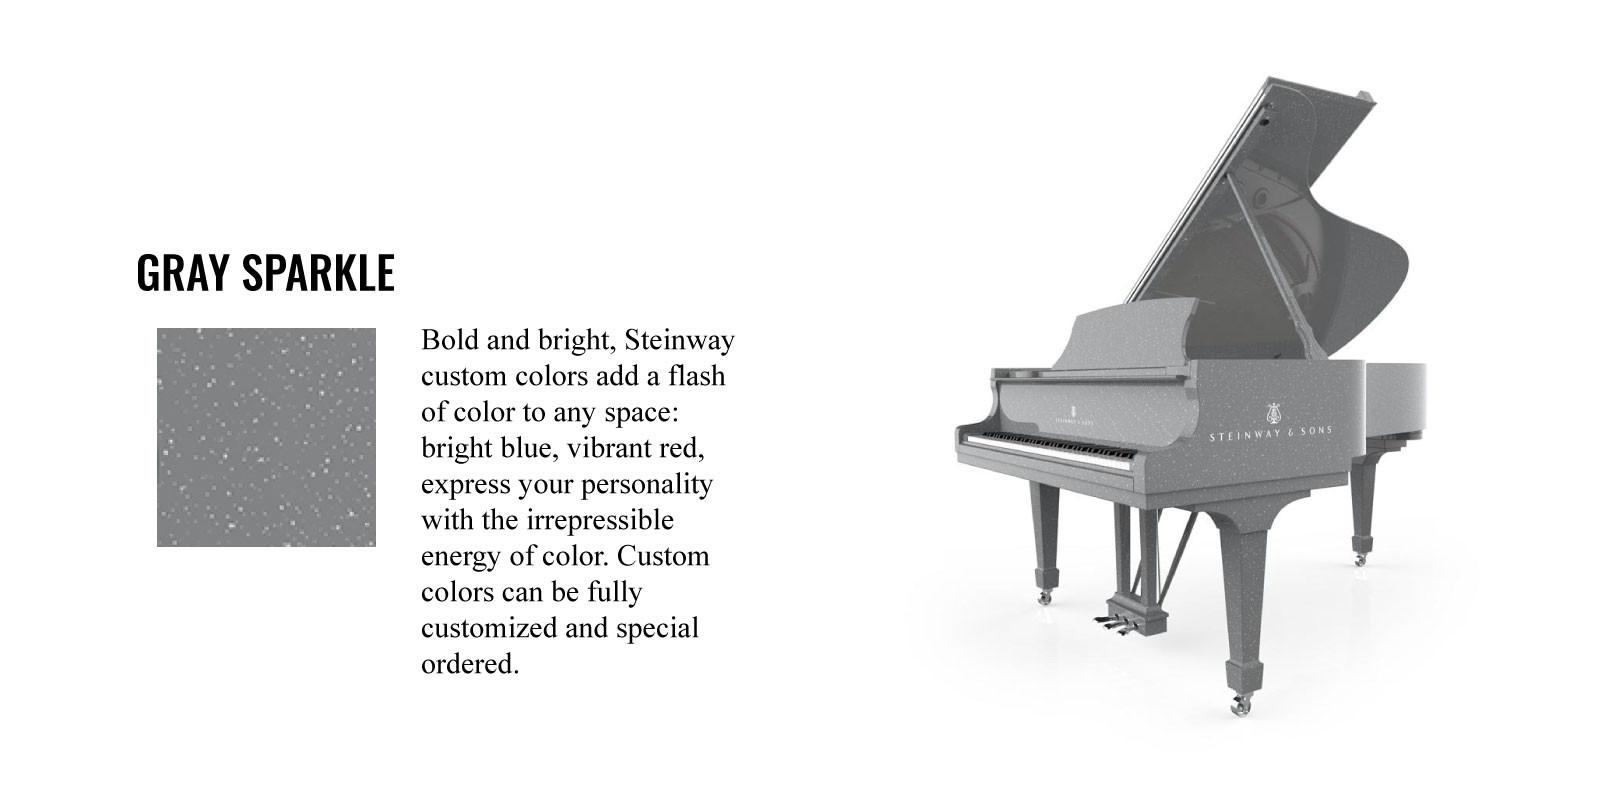 PP-Steinway-Custom-Color-Slideshow-12.jp